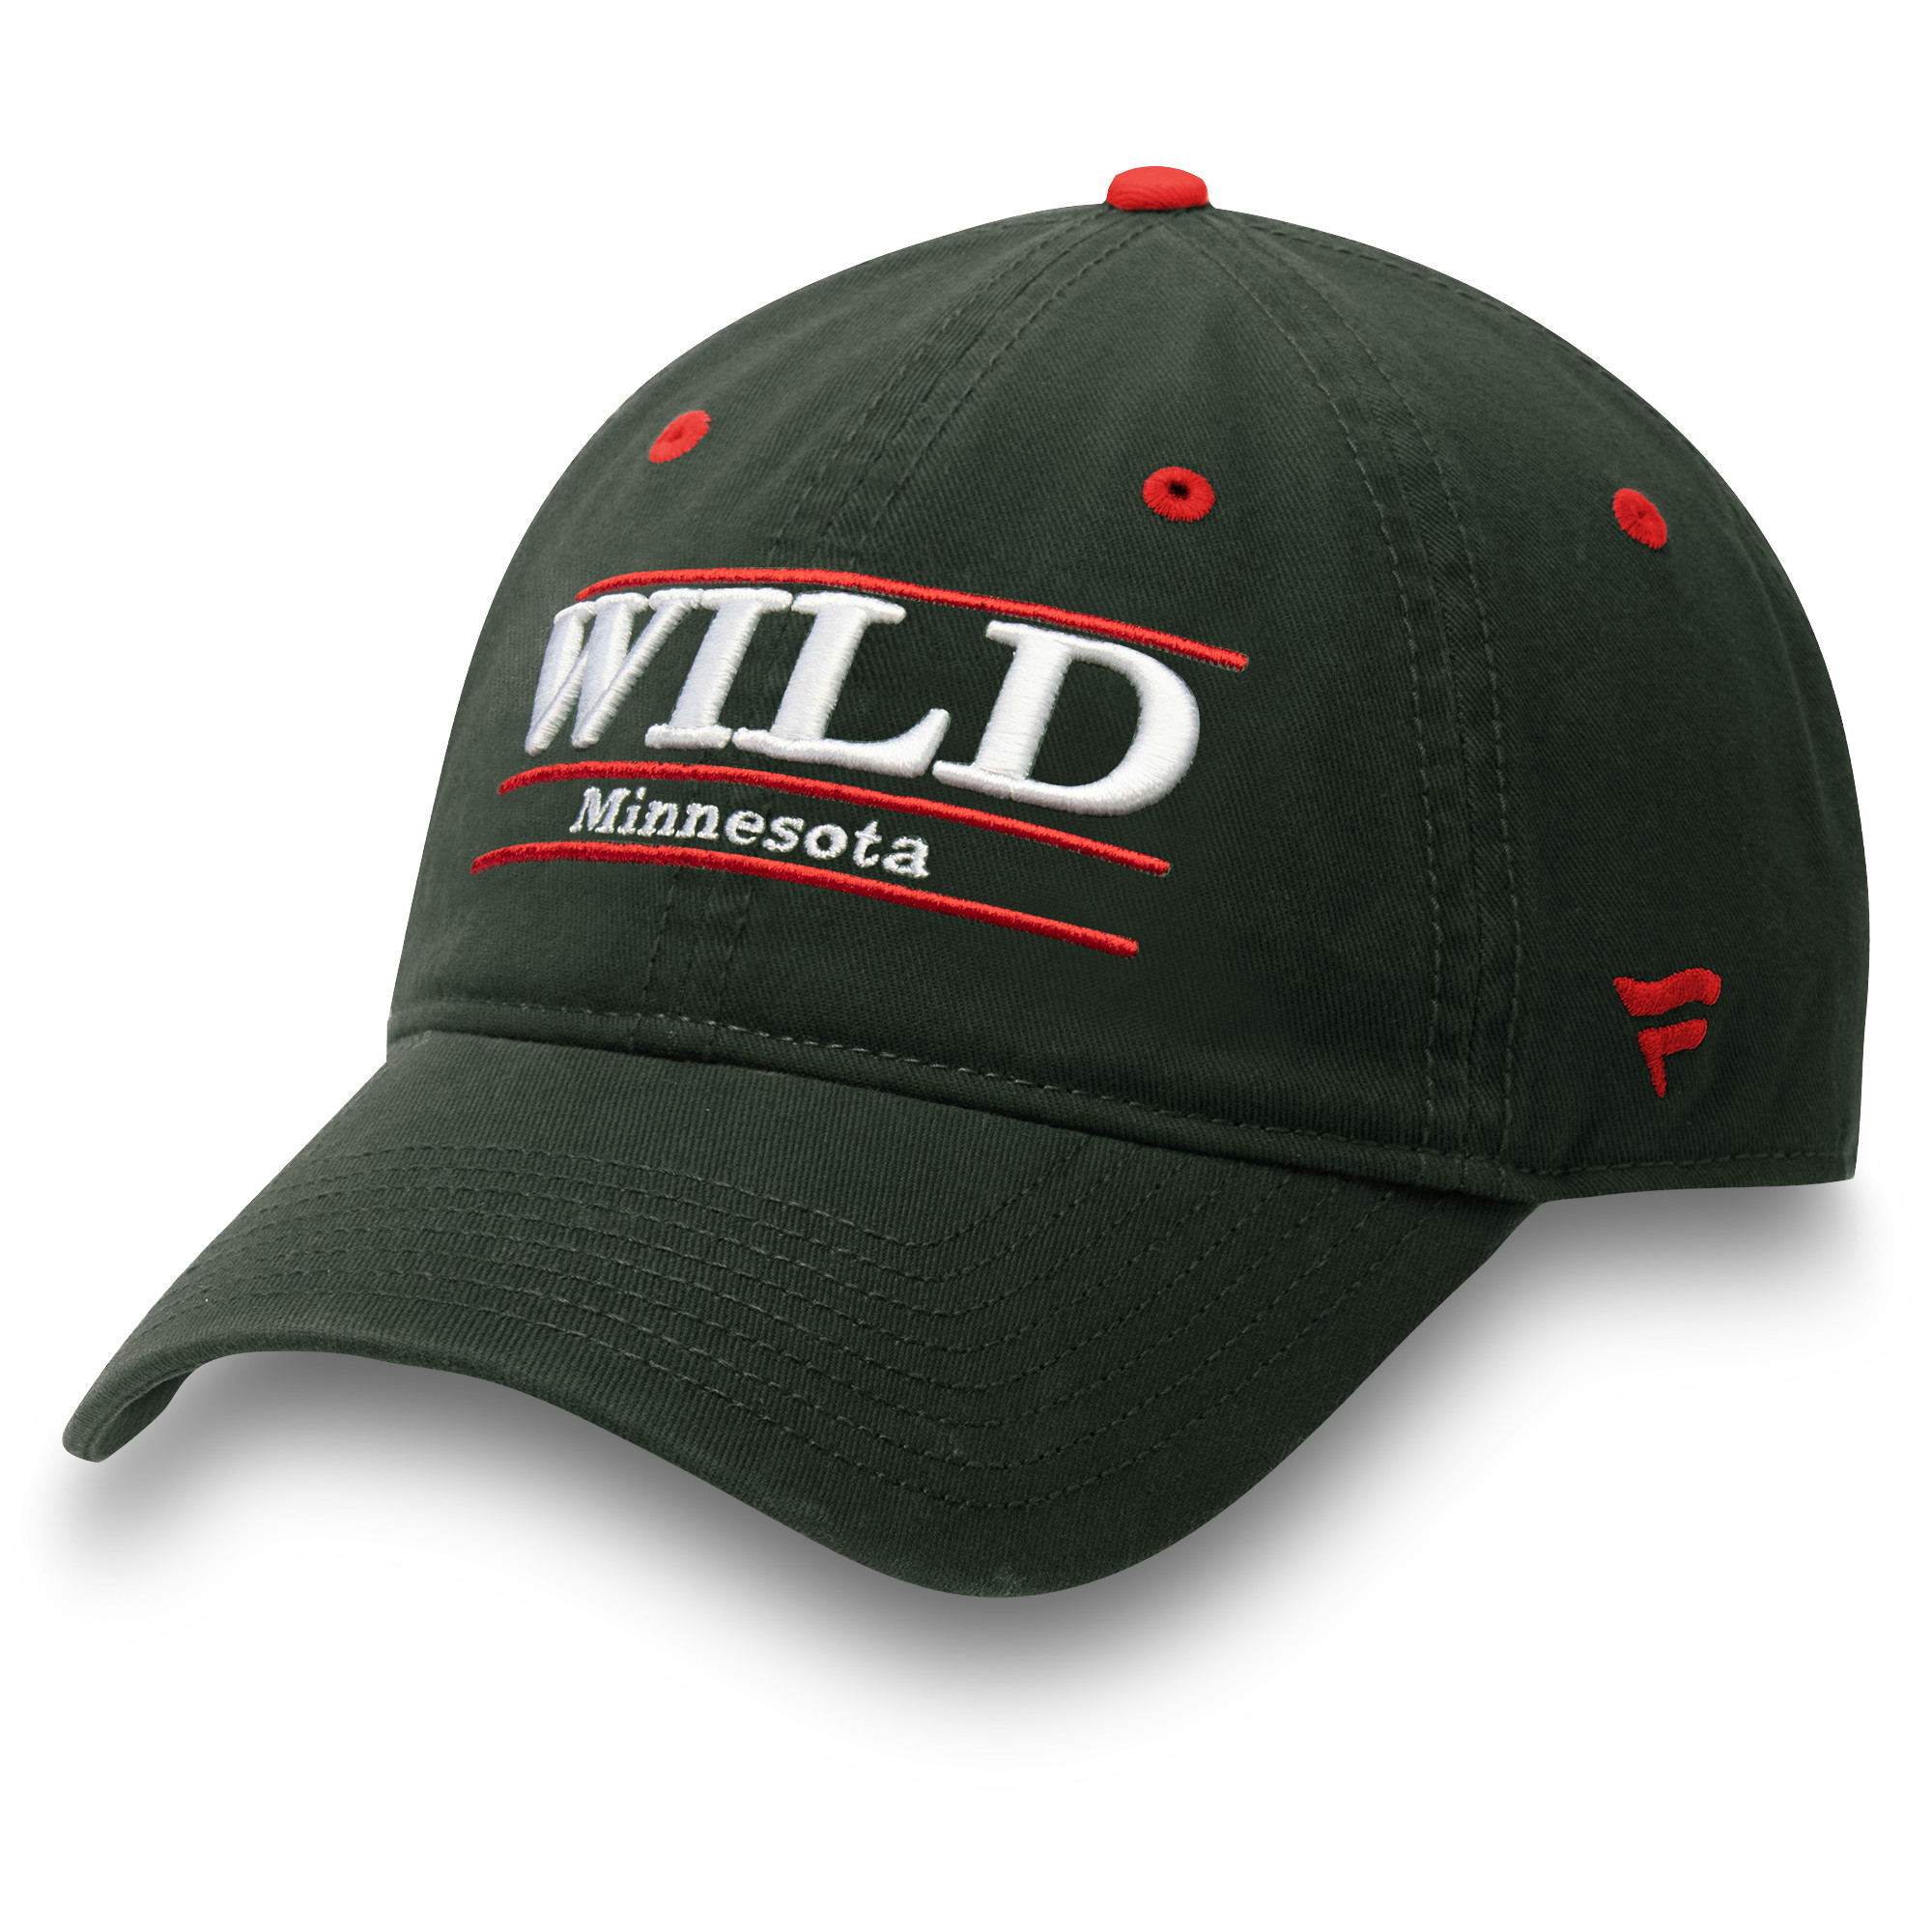 Minnesota Wild Fanatics Branded Primary Bar Adjustable Hat - Green - OSFA